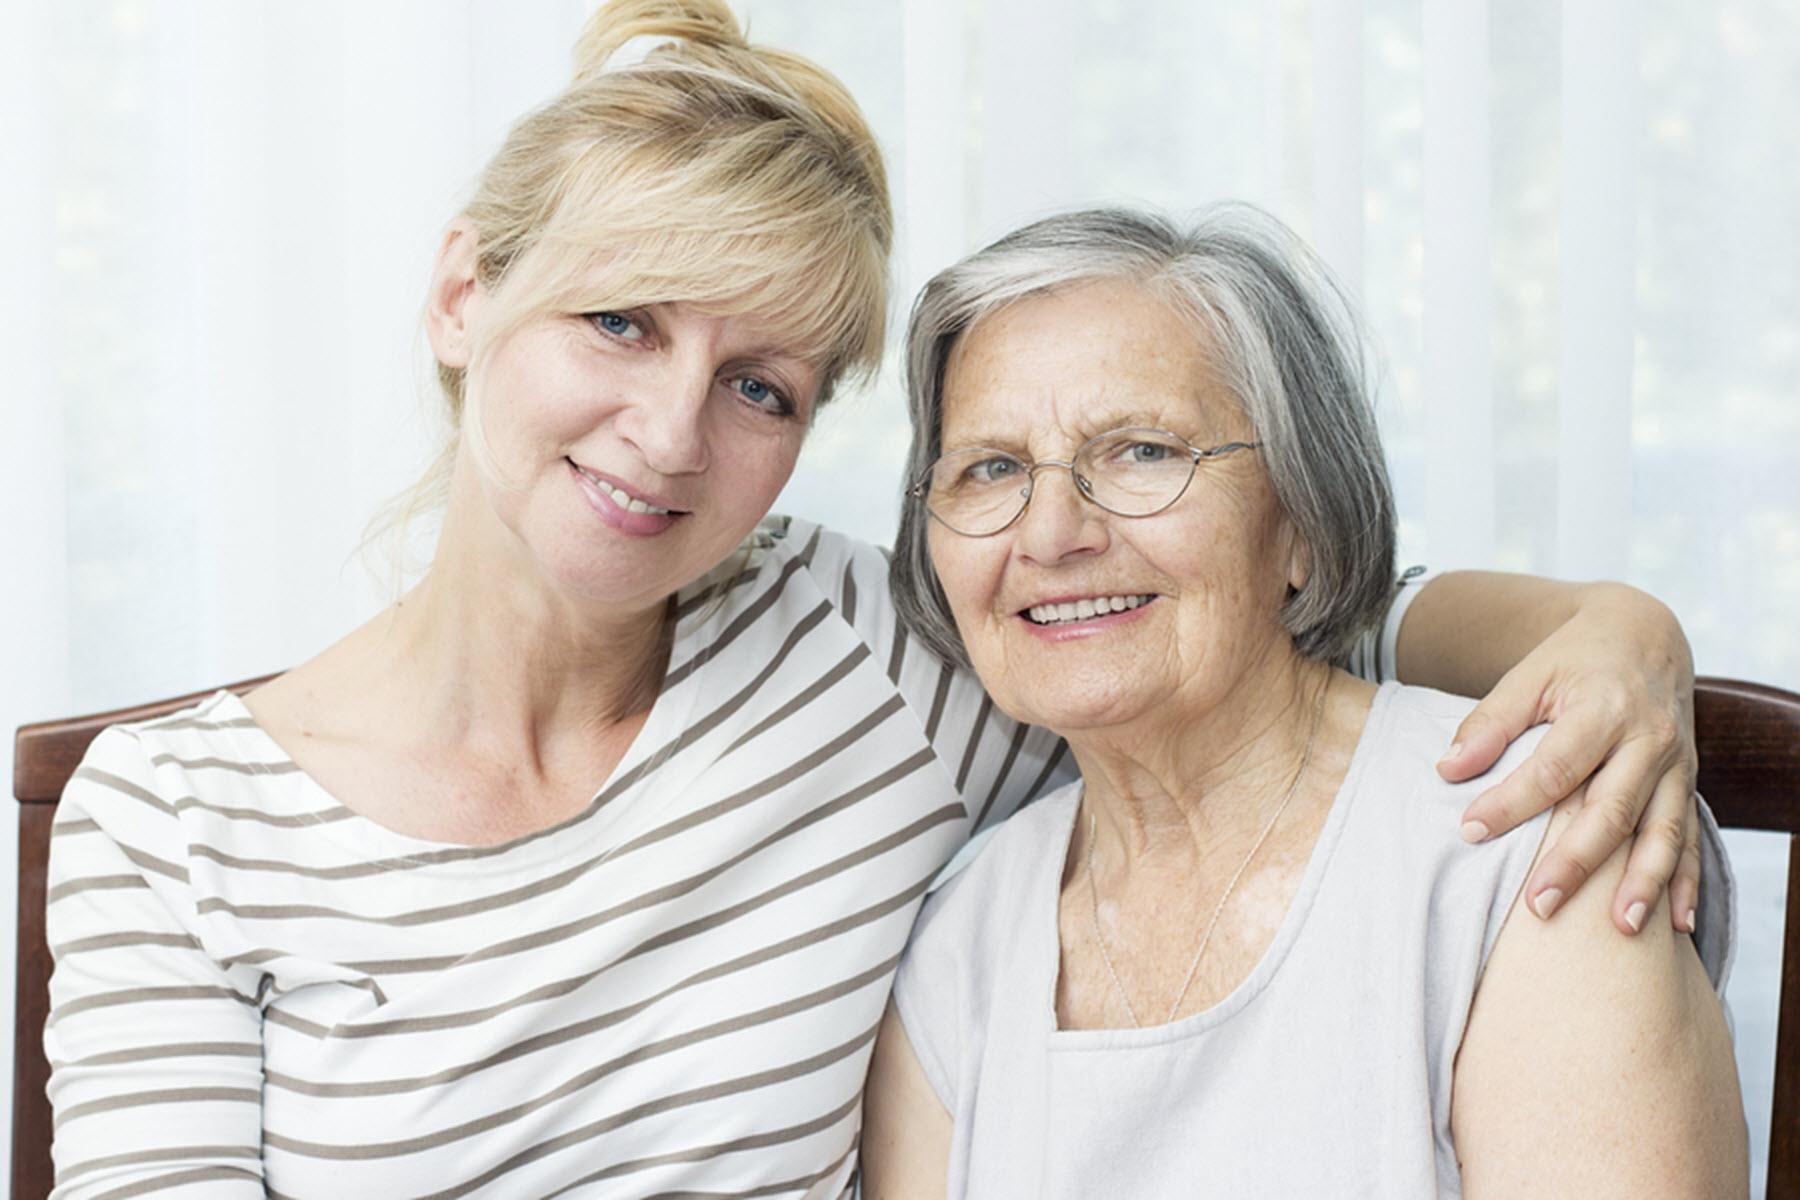 Elder Care in Buckeye AZ: Stop Doing Everything Alone